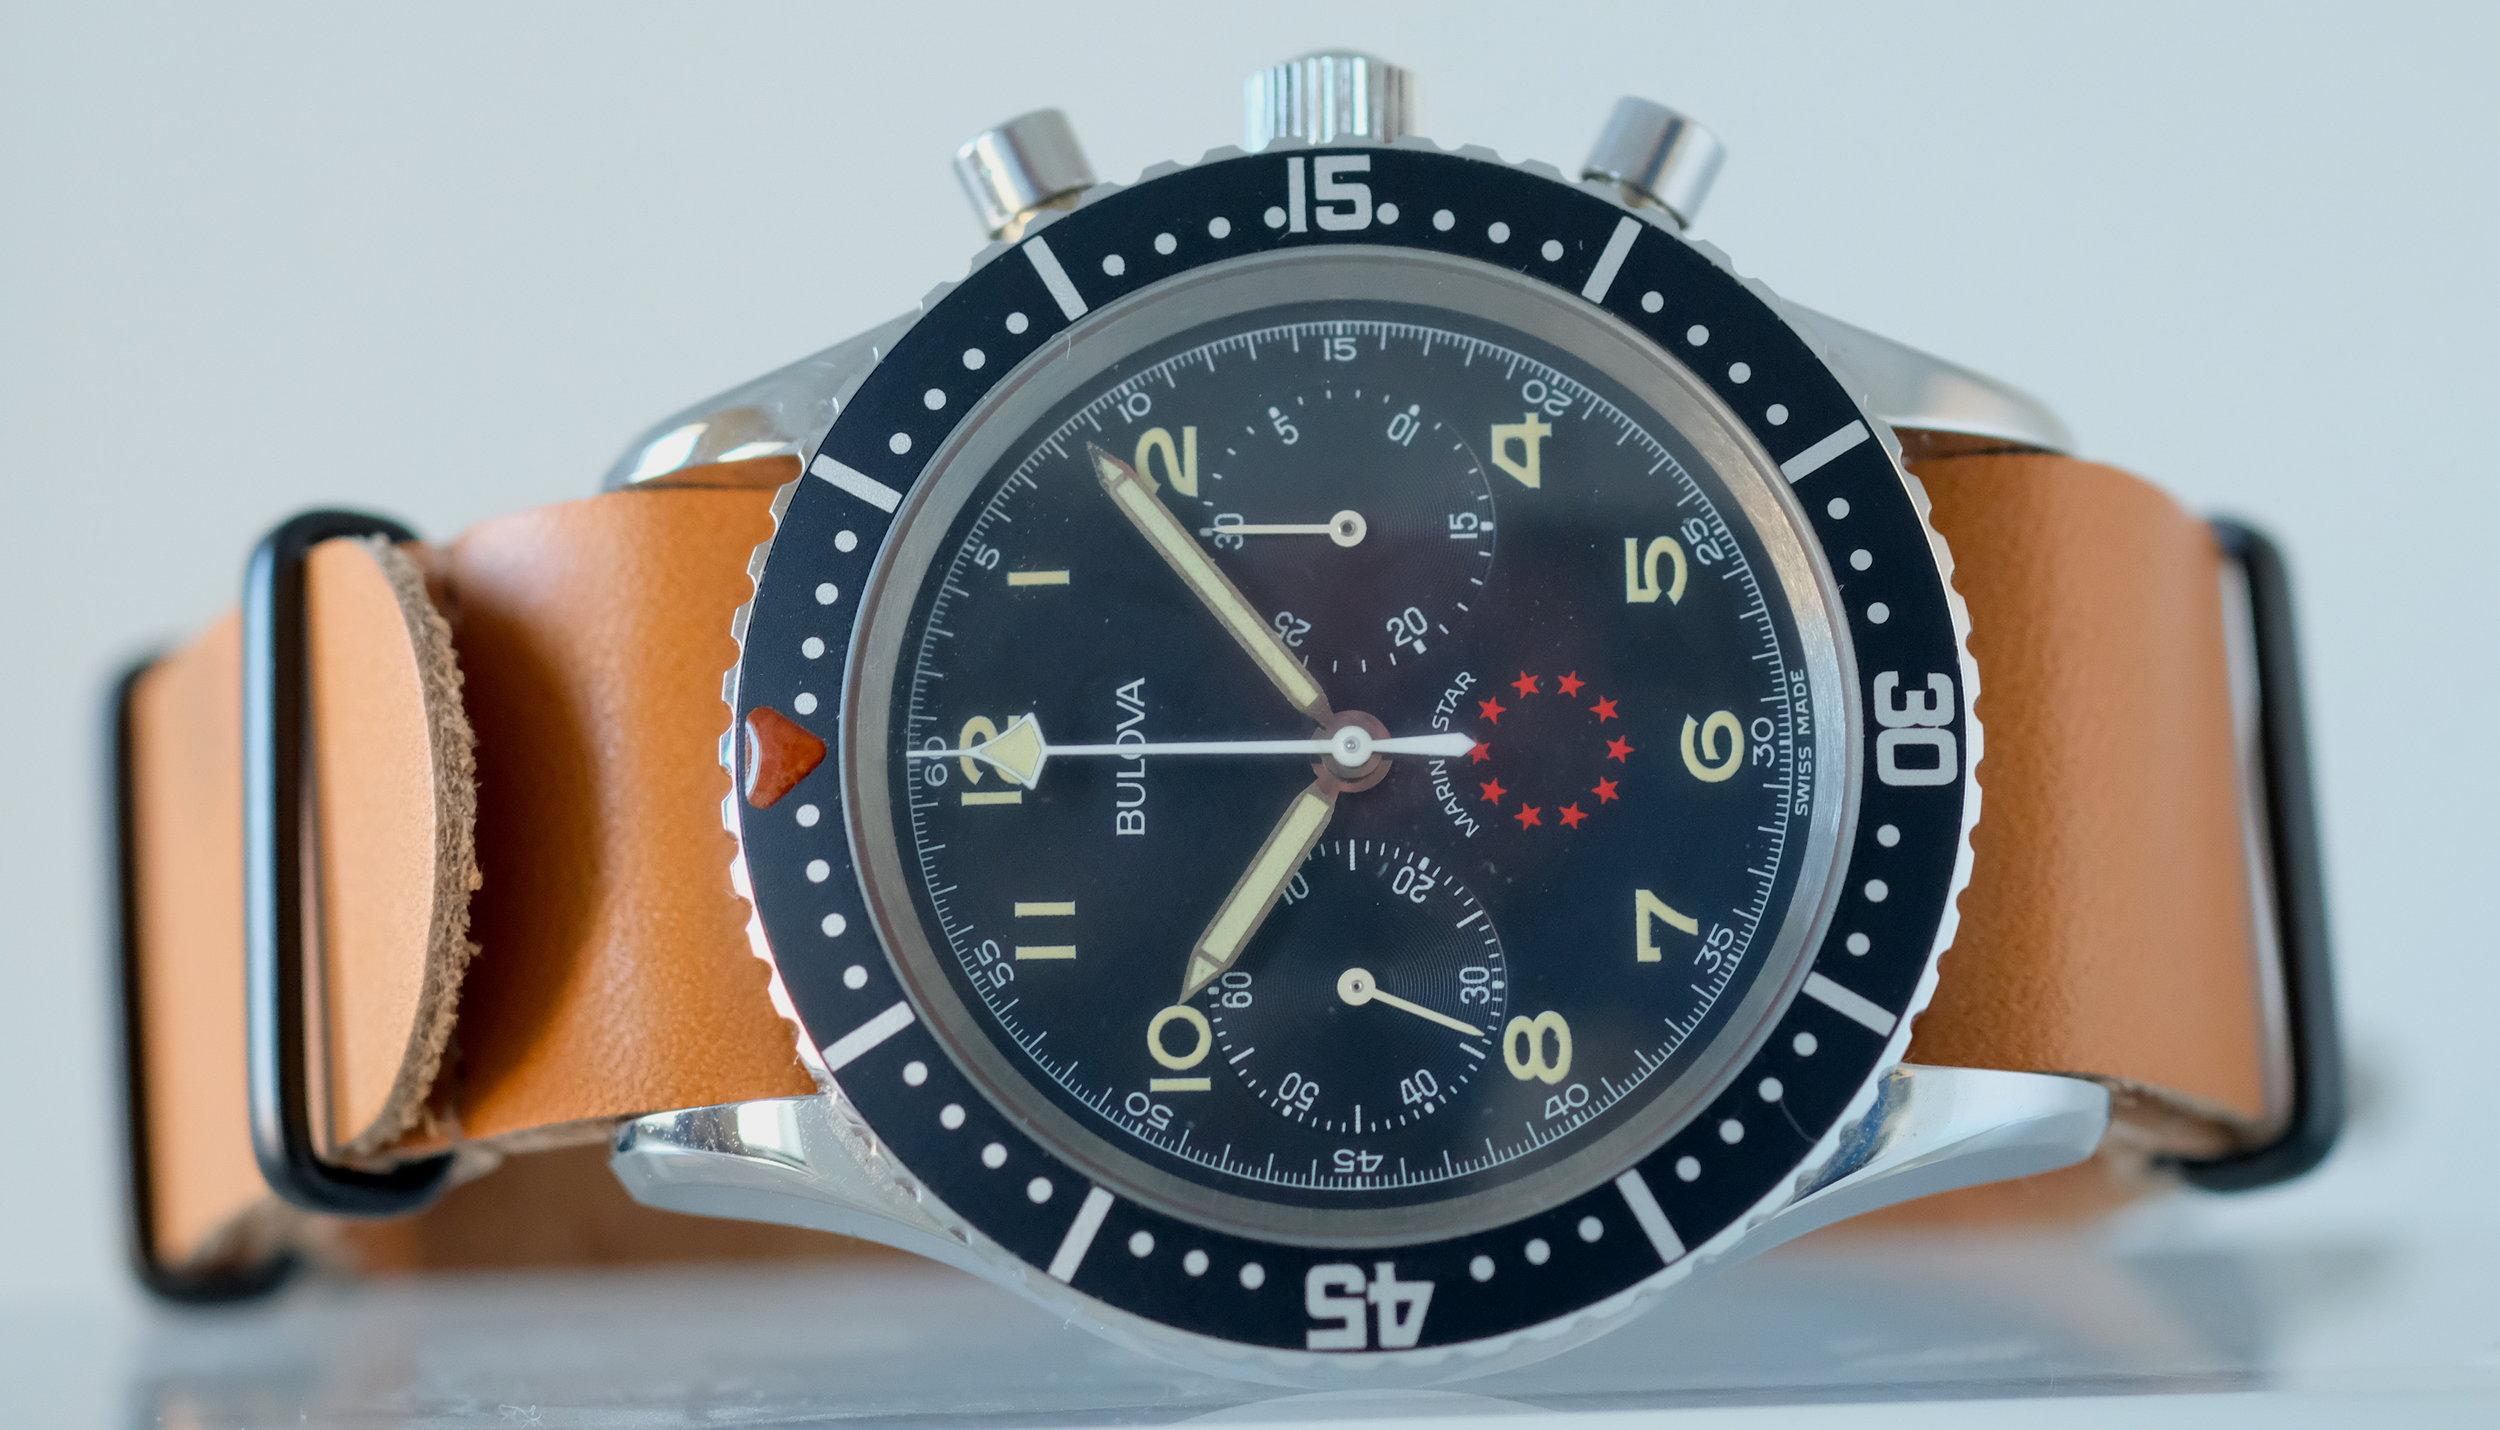 Bulova Marine Star Chronograph  Price: $6,995